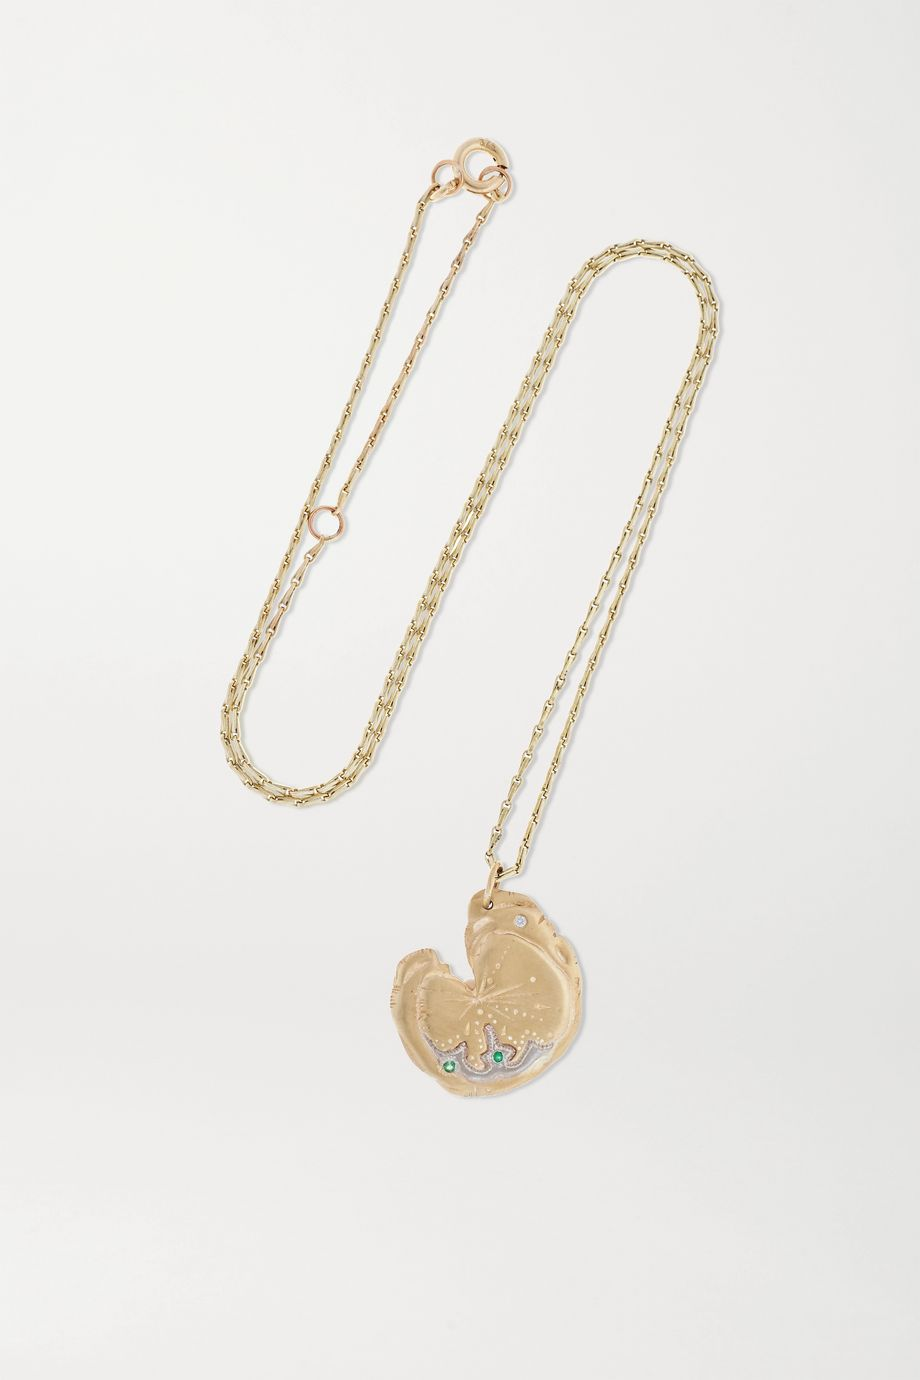 Pascale Monvoisin Calypso N°1 9-karat gold, emerald and diamond necklace